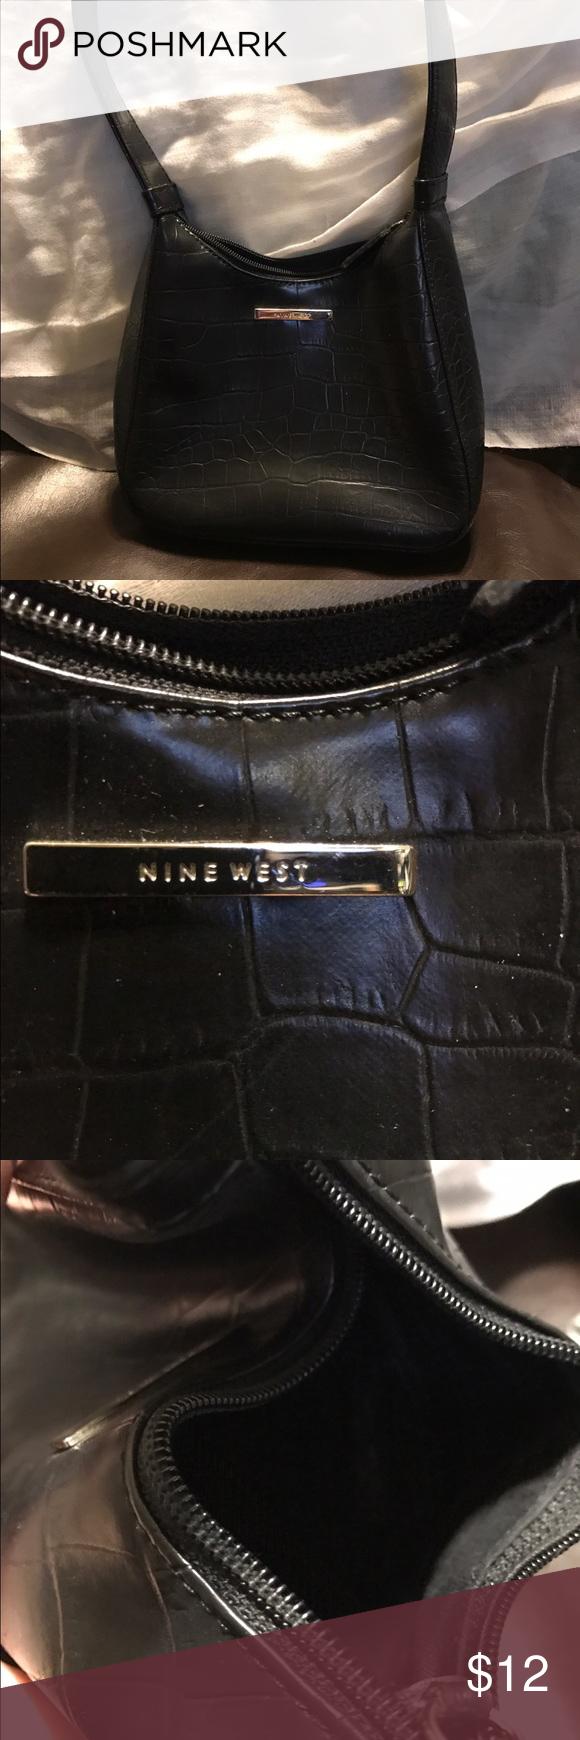 e9163deee44 Cute Nine West purse Cute small black purse Nine West Bags Mini Bags ...